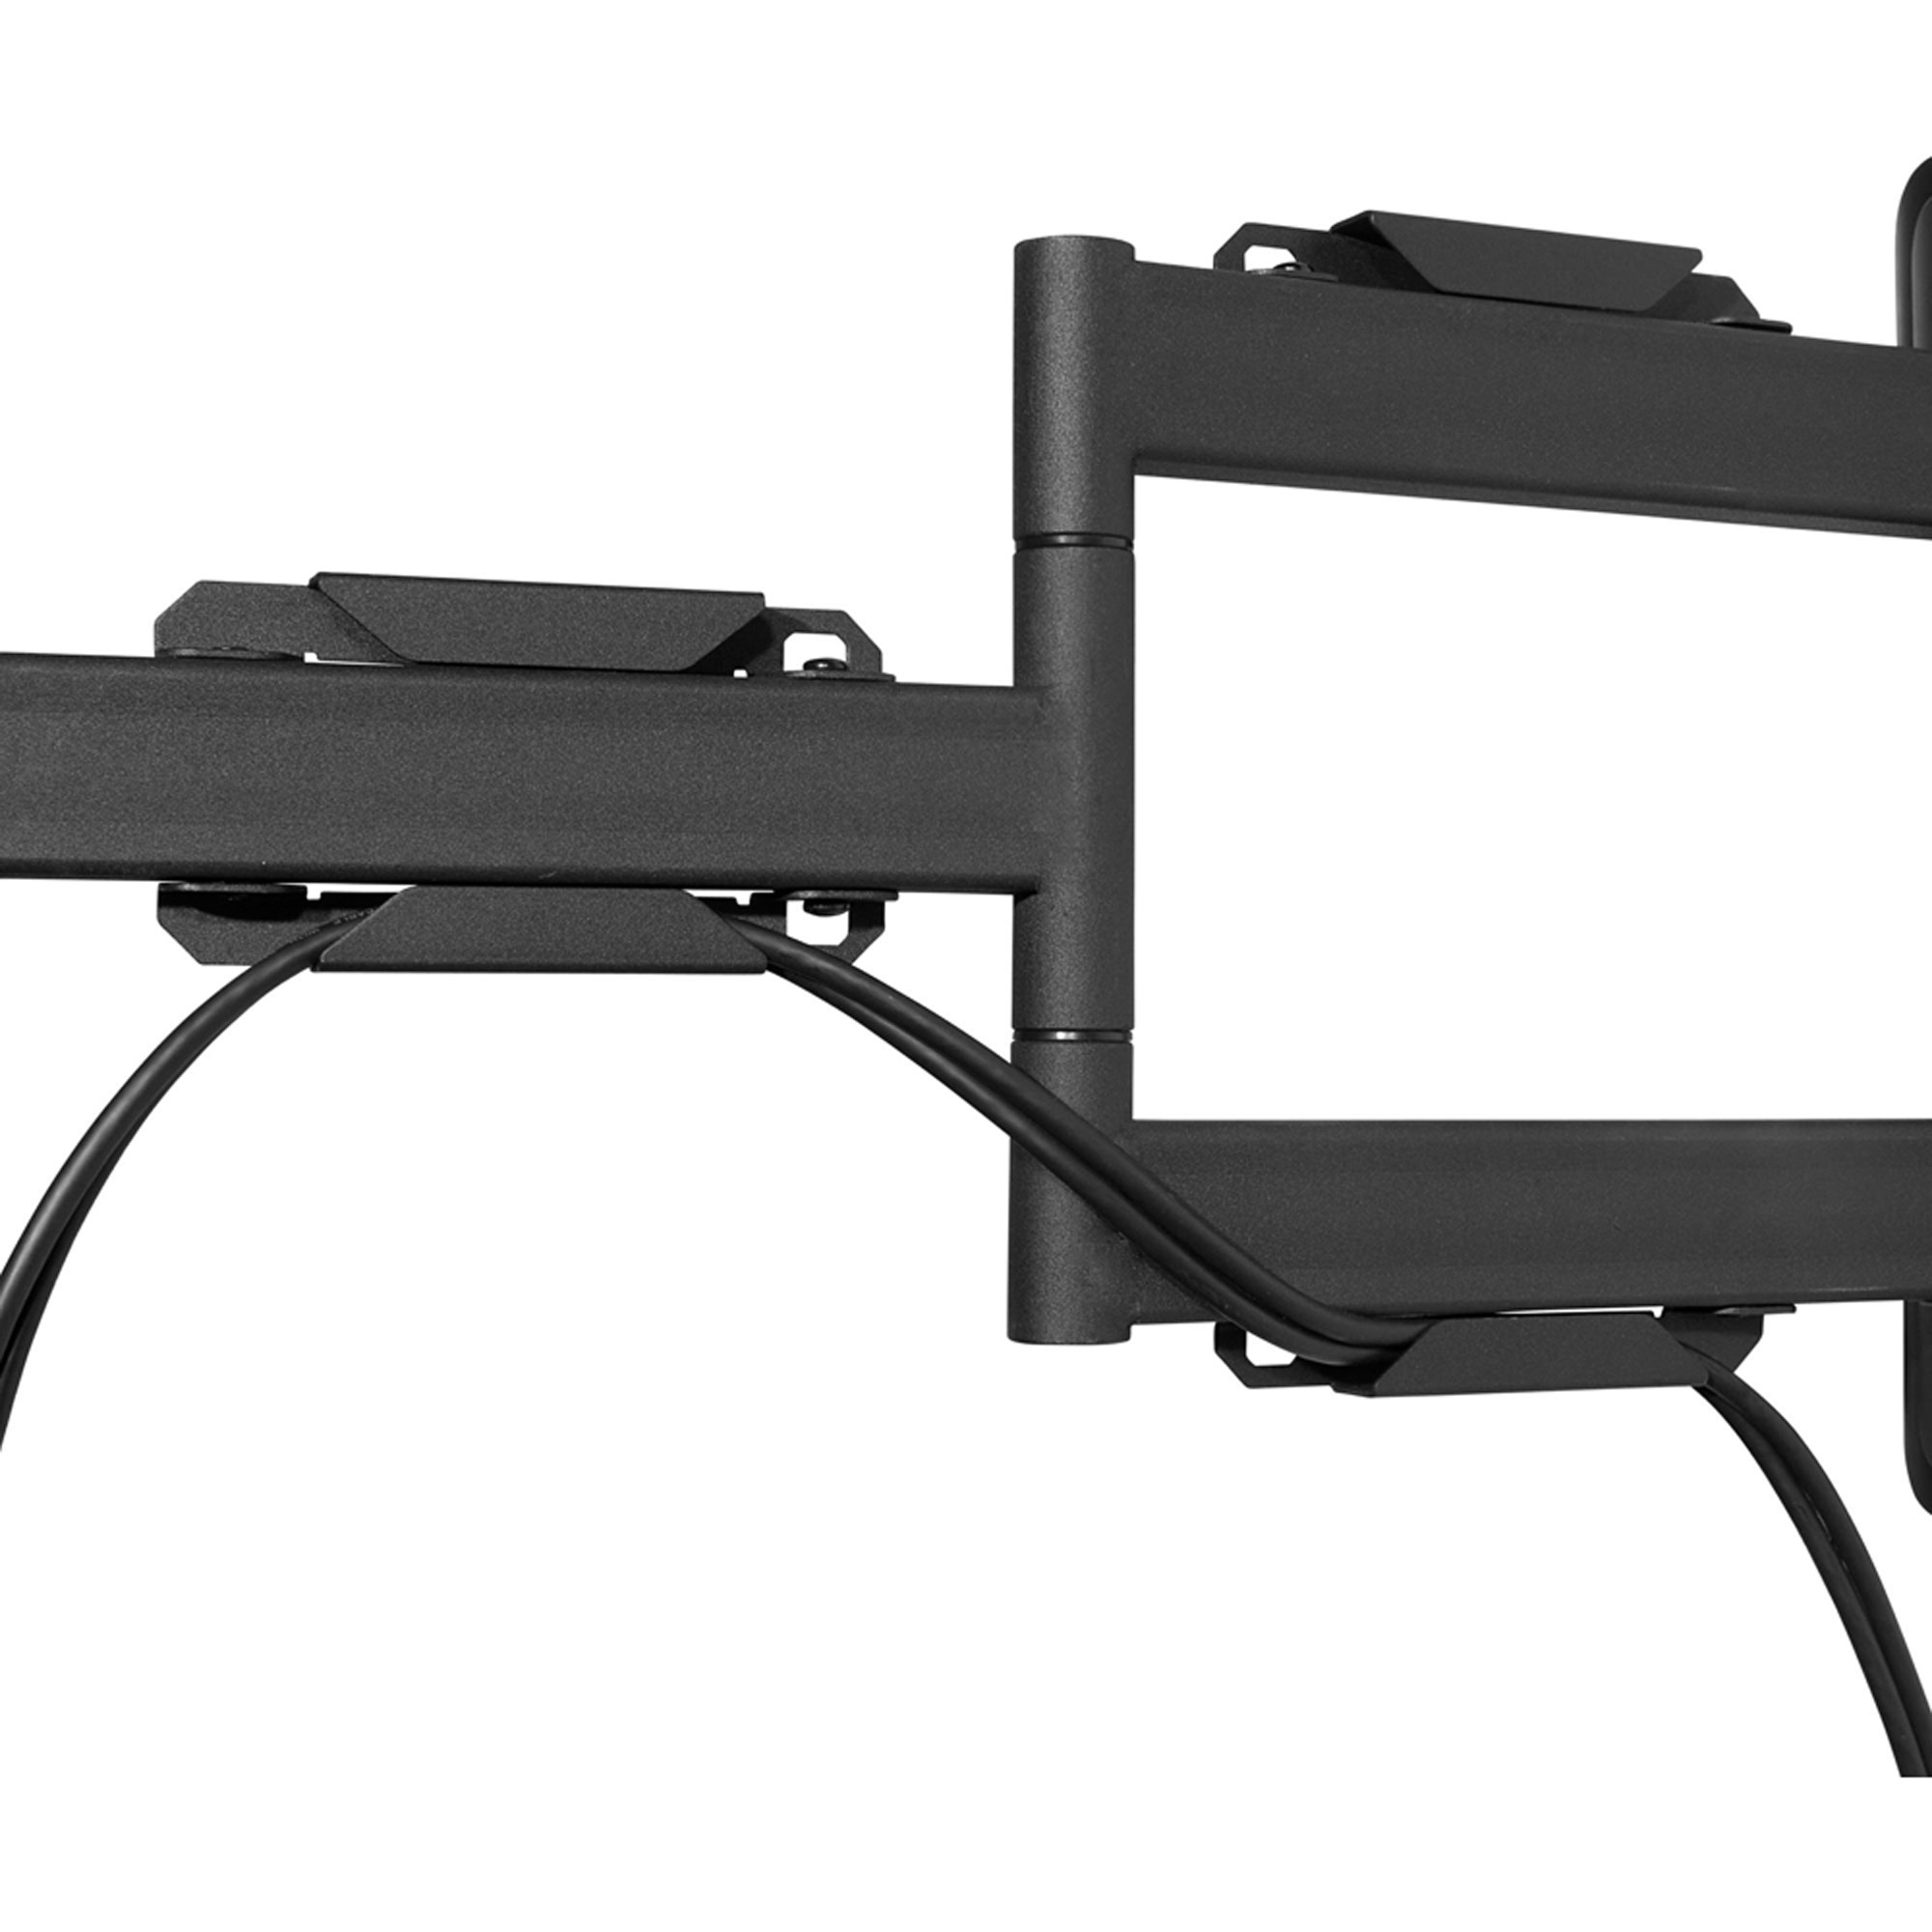 "PS300 Full Motion TV Wall Mount for 26""-60"" HDTVs"